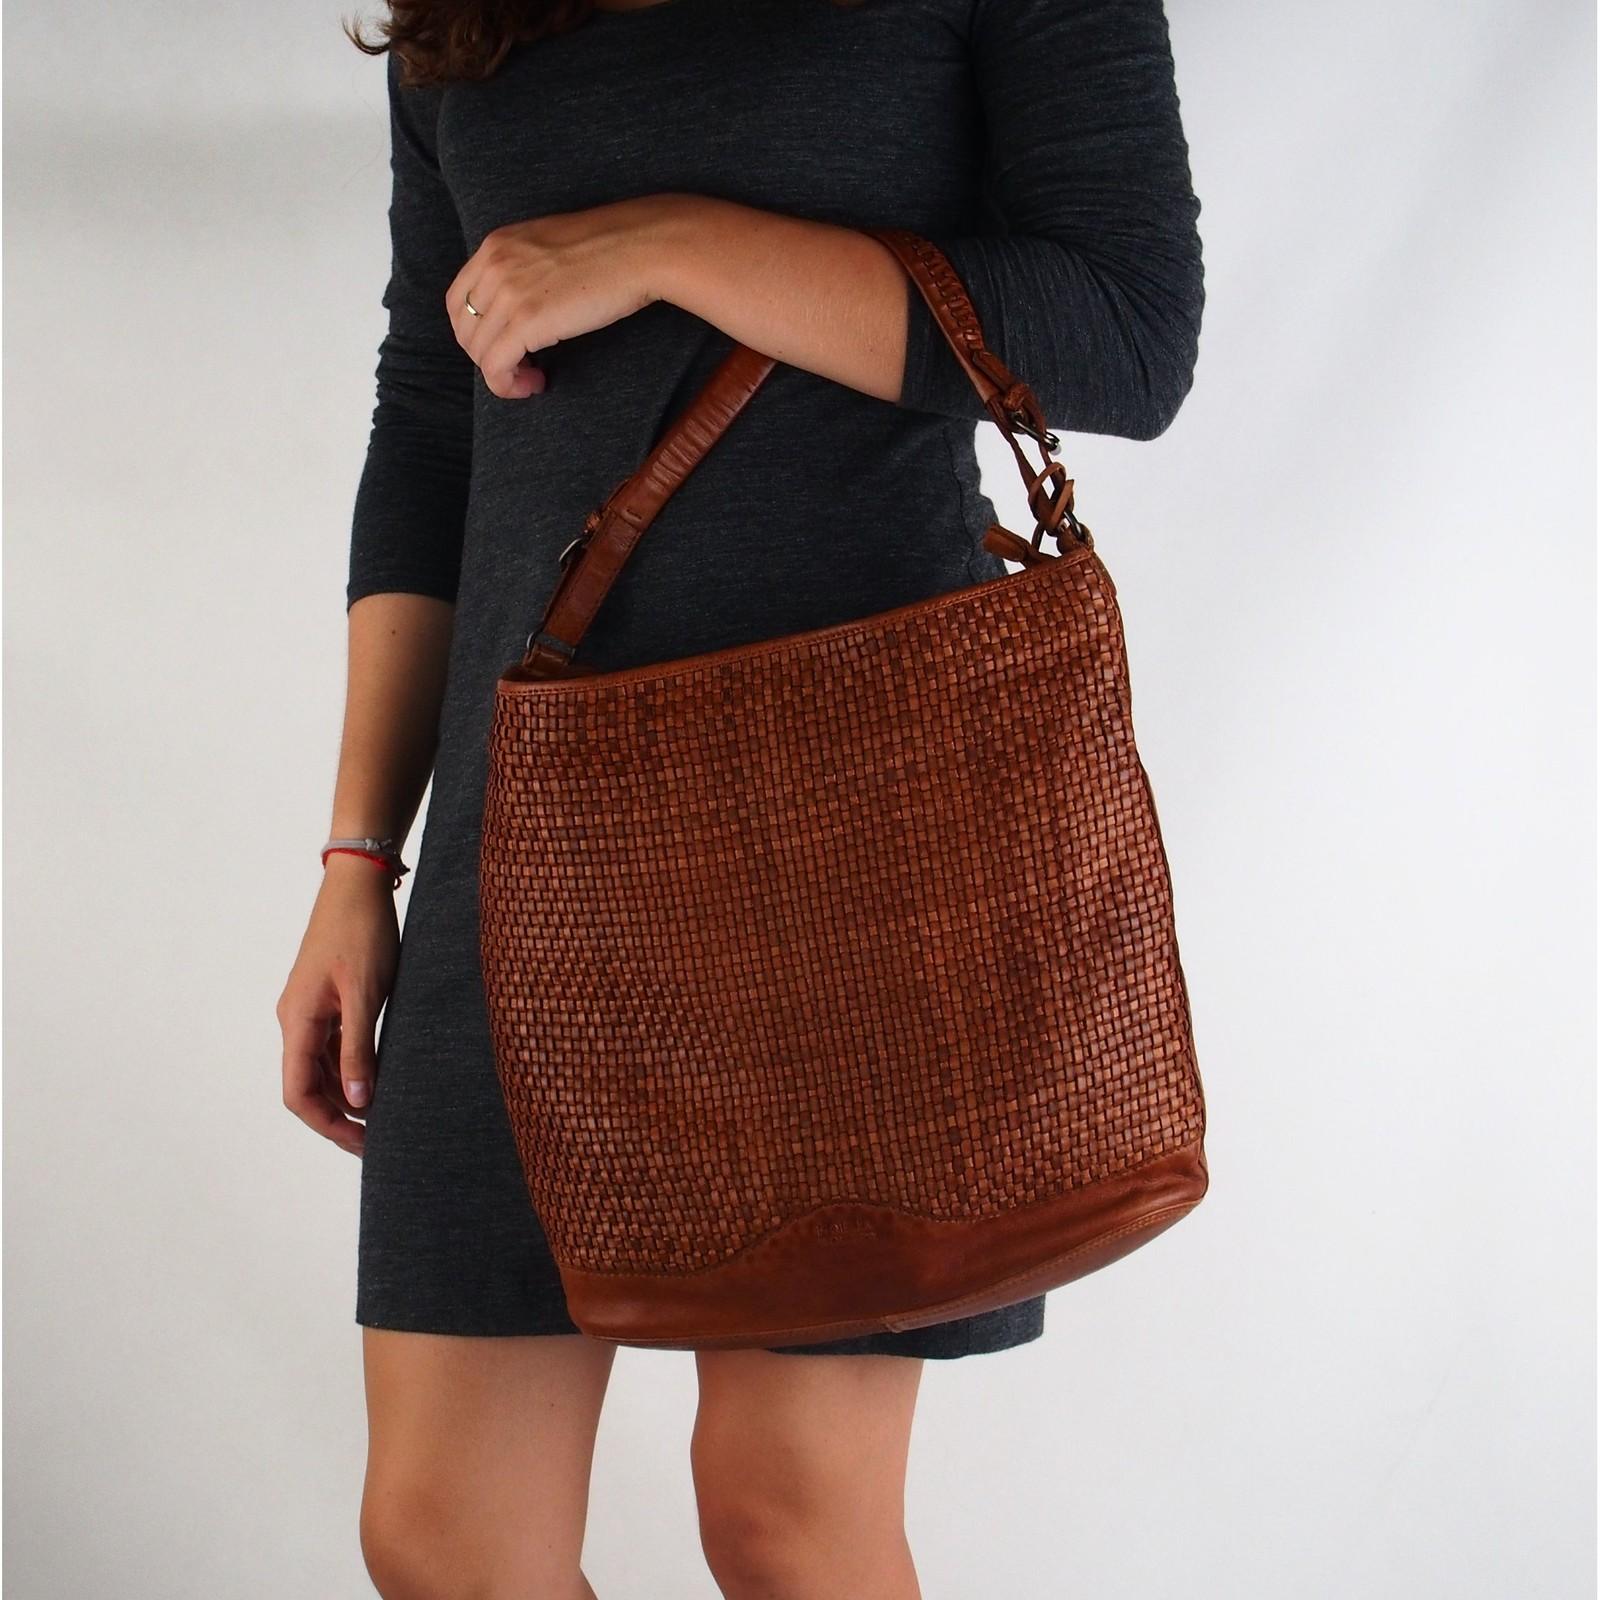 Noelia Bolger dámska kožená kabelka - hnedá